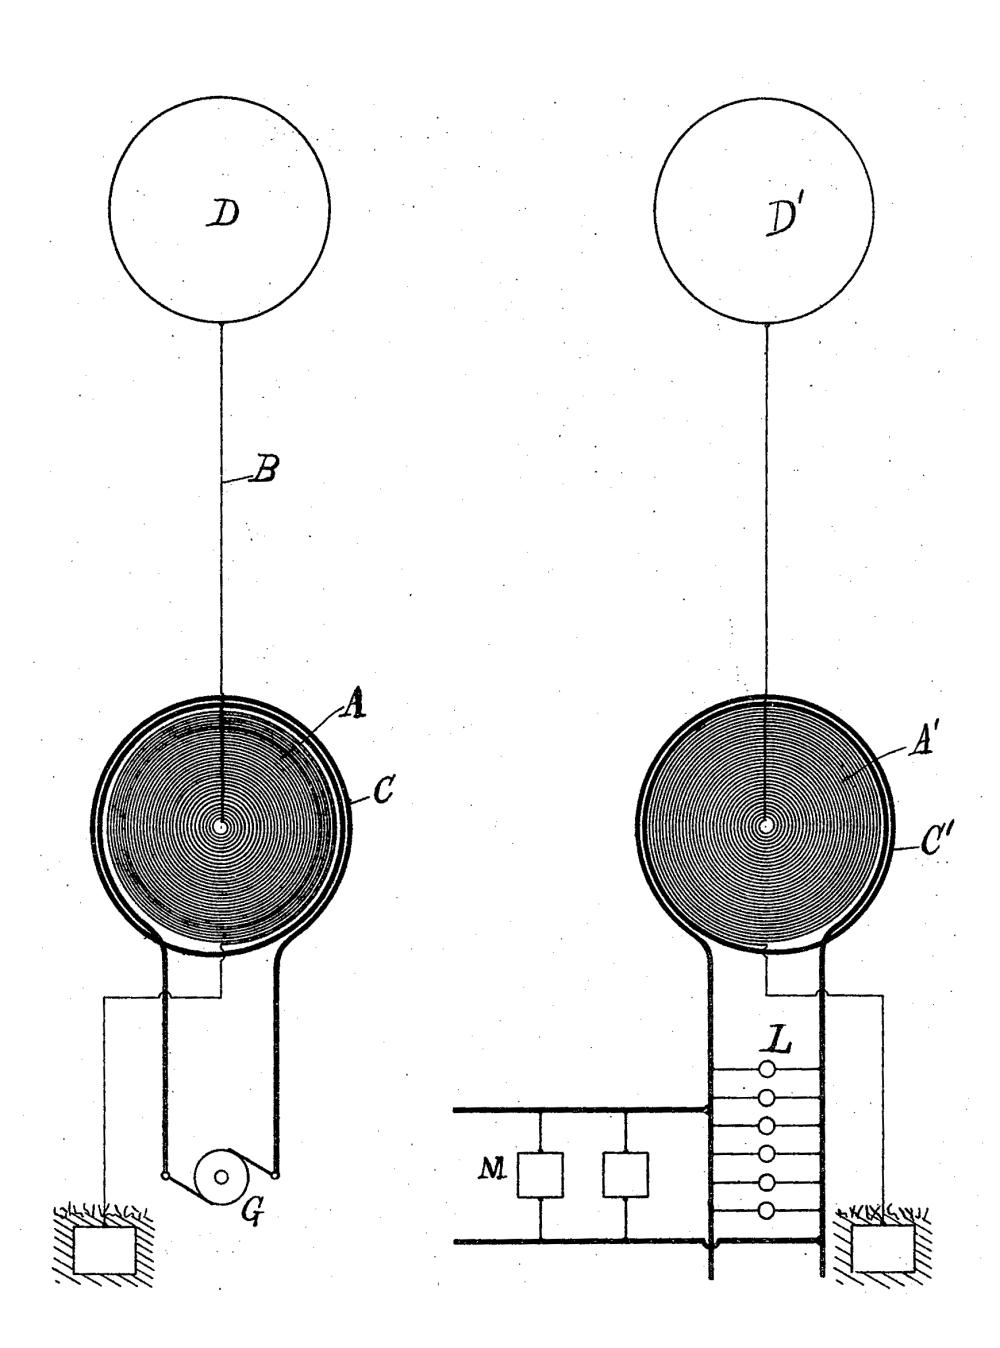 medium resolution of file us patent 645576 nikola tesla 1897 system of transmission of wireless power transfer circuit diagram in addition tesla free energy